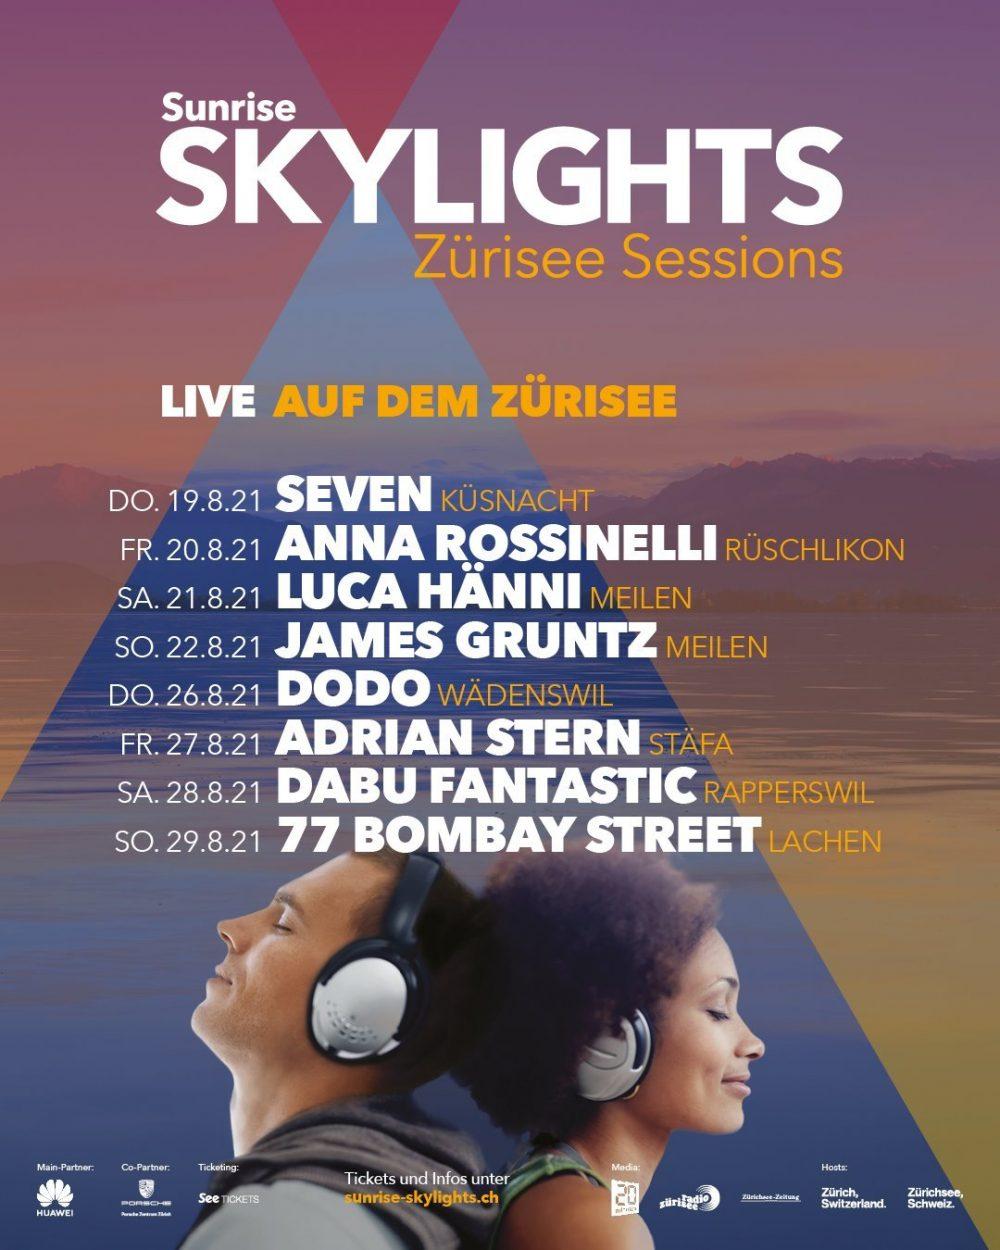 Sunrise Skylights Zürisee Sessions - Music on Lake Zurich